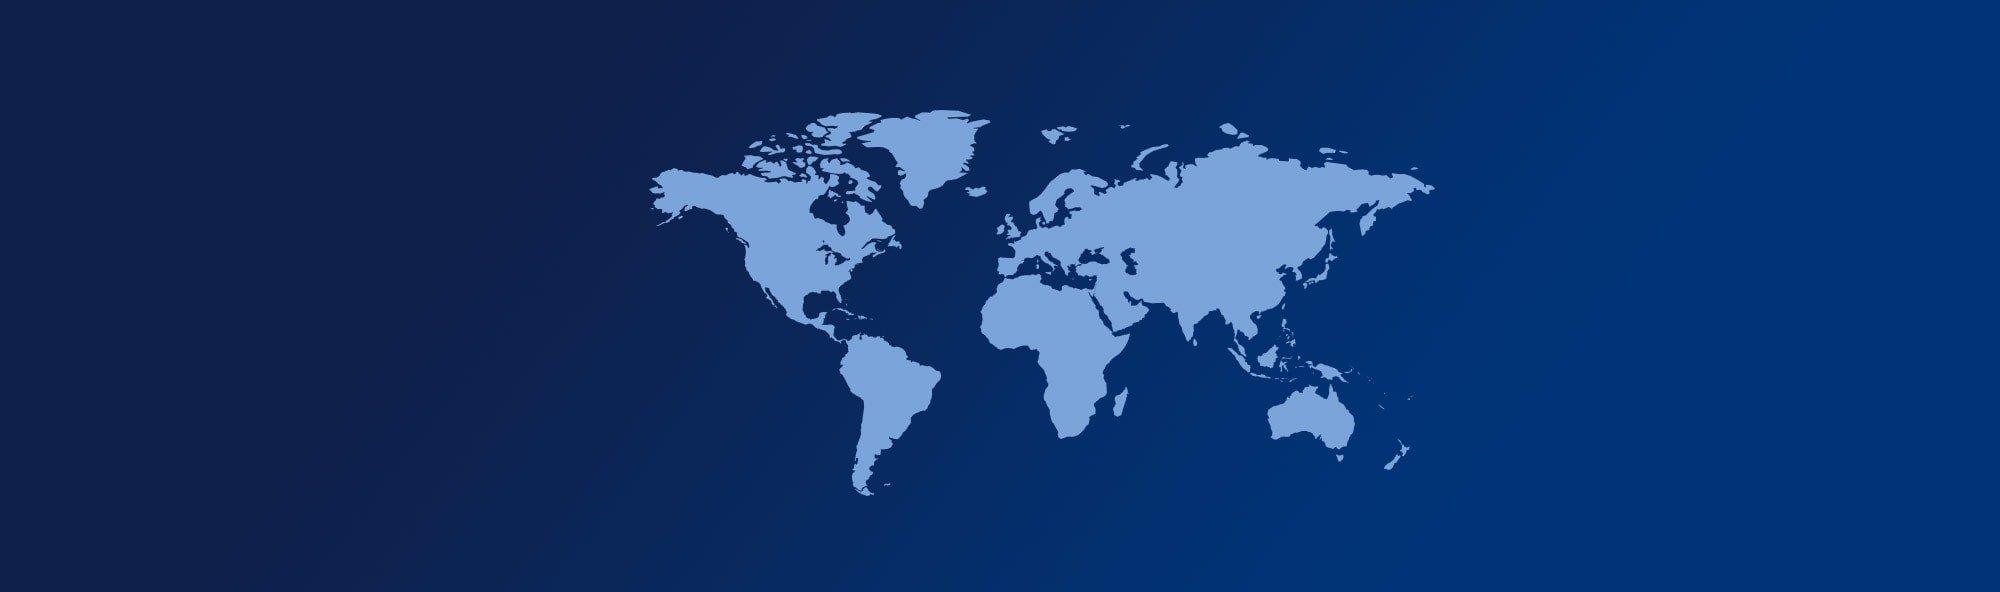 2000x592_worldmap